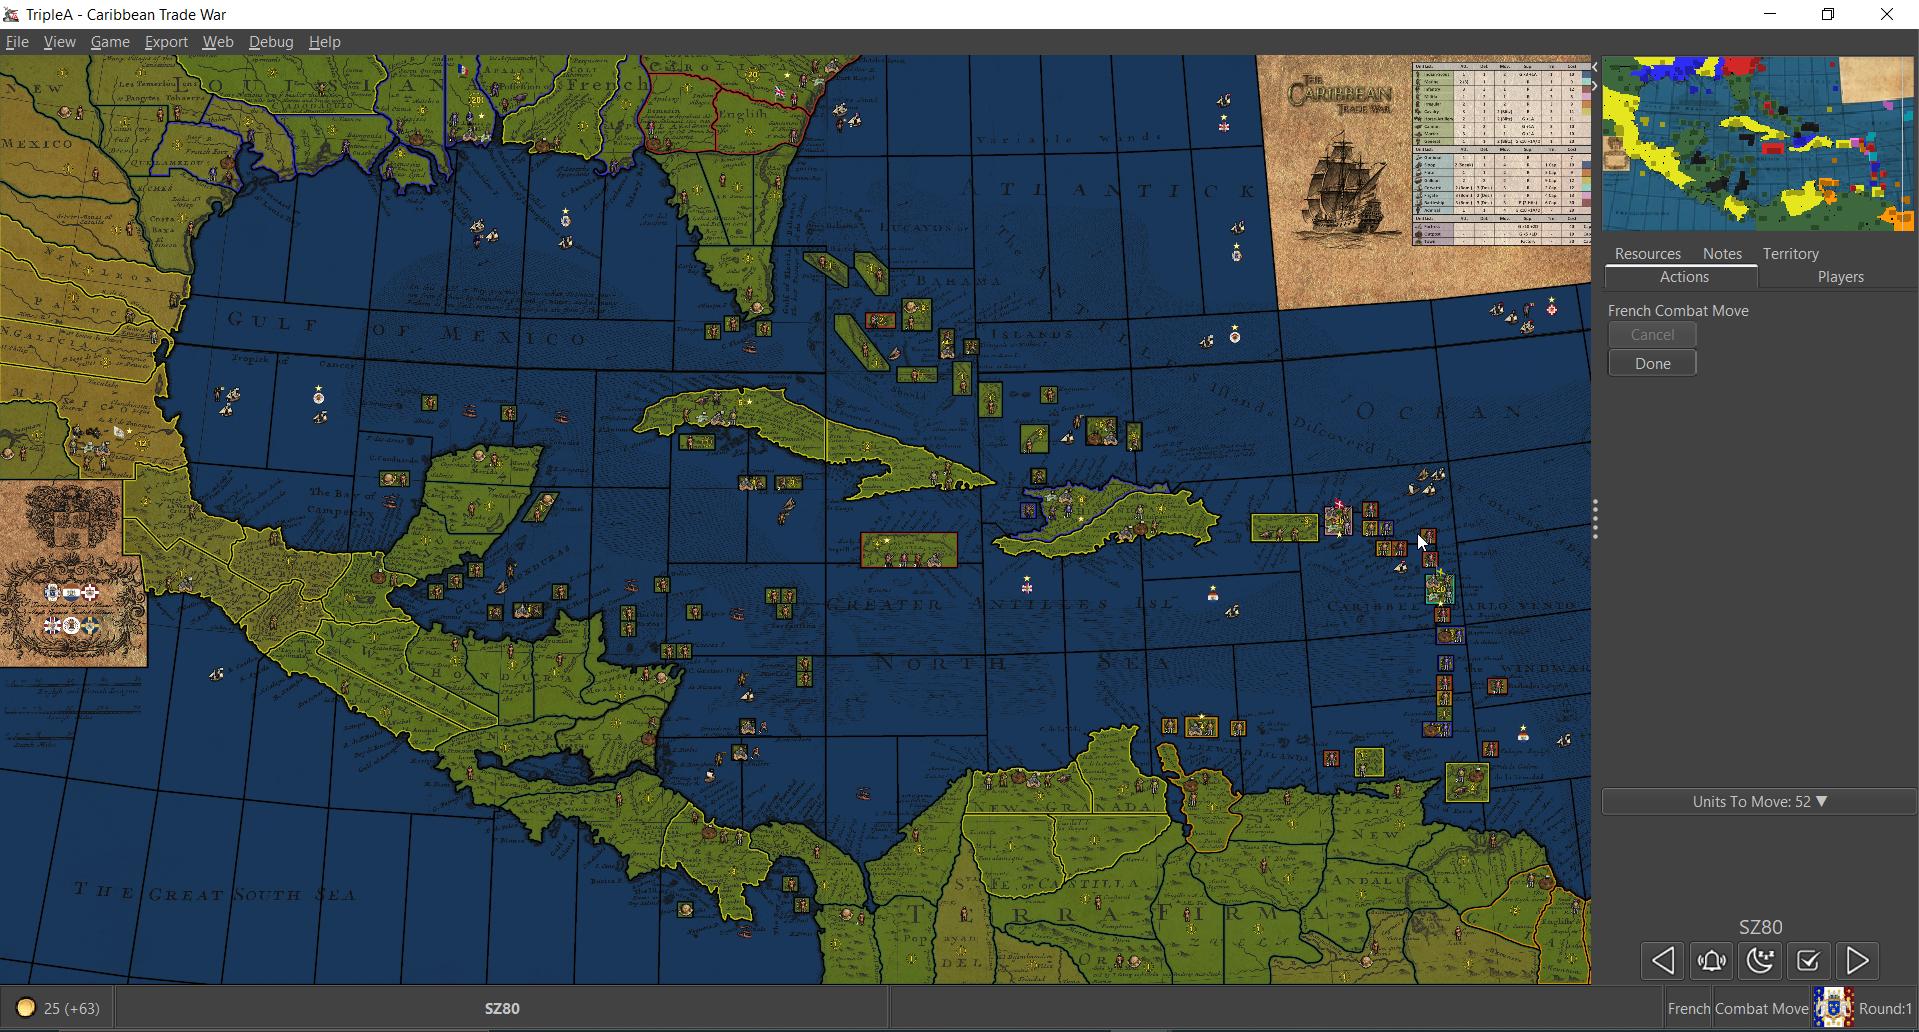 Caribbean Trade War